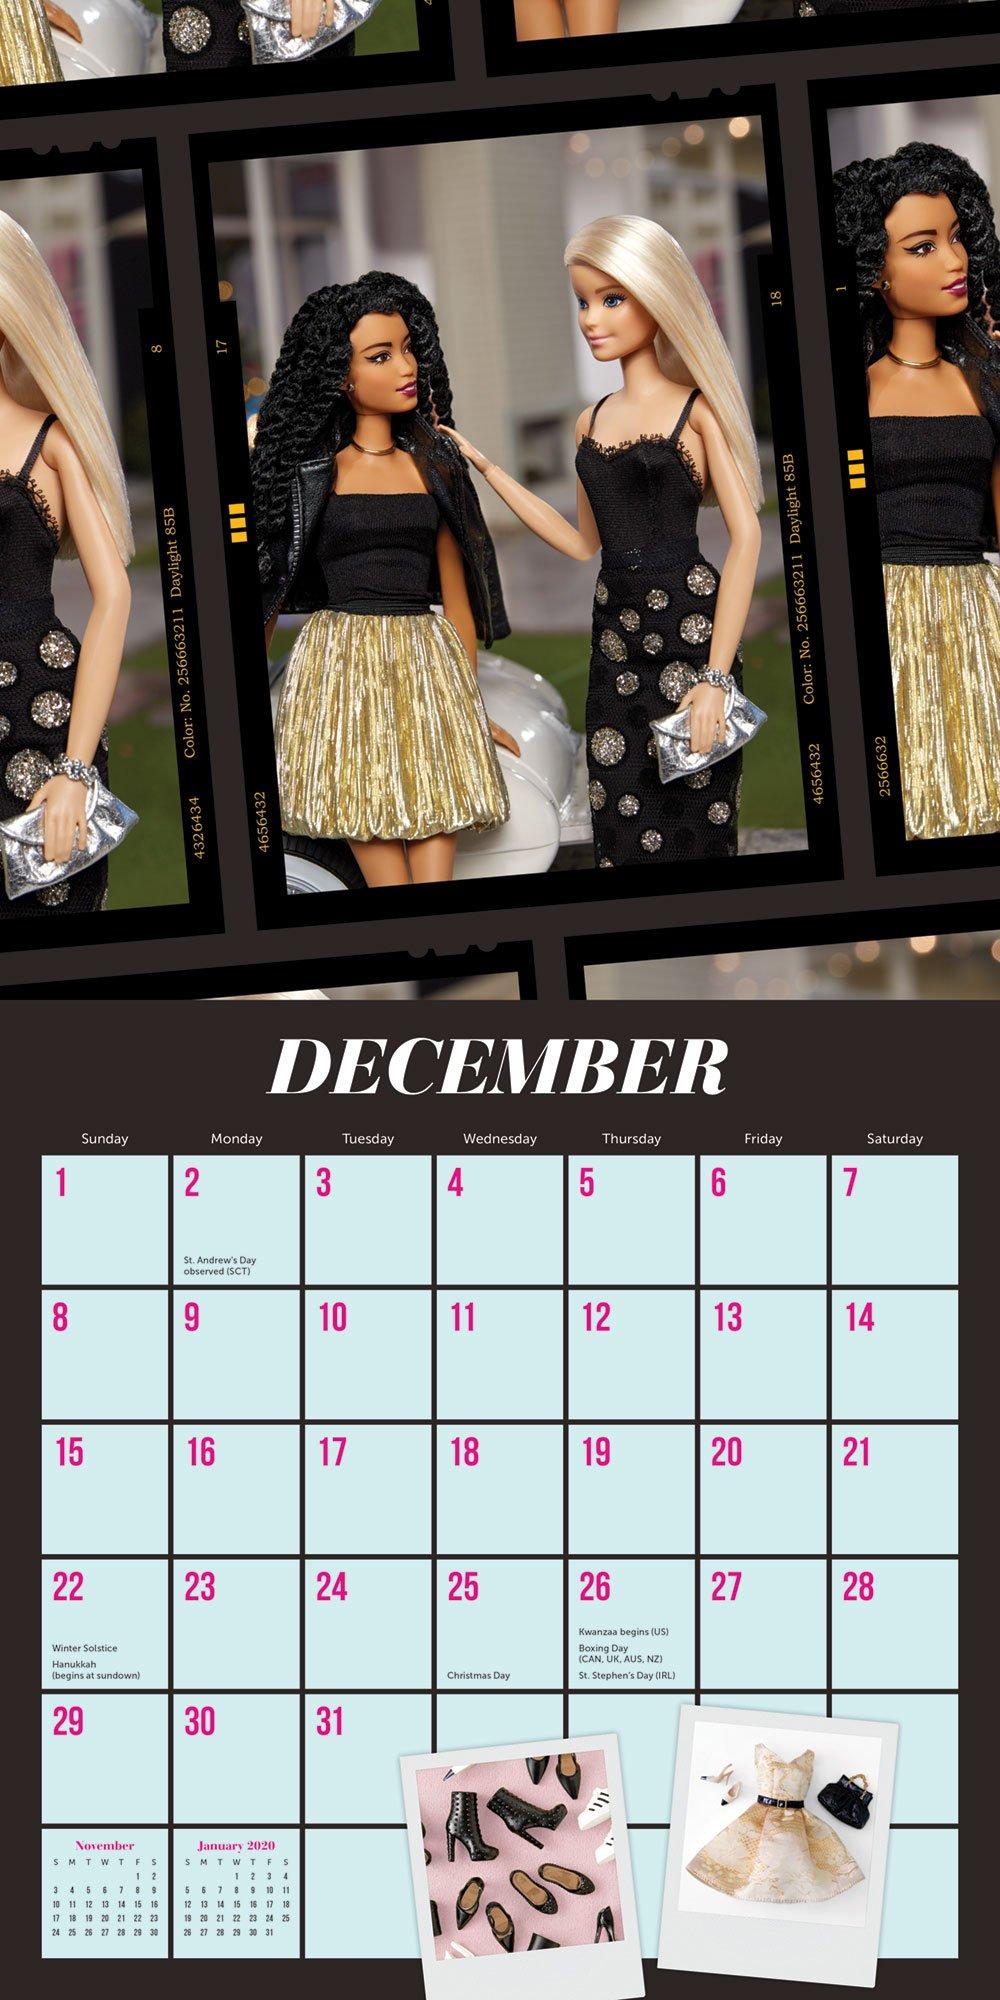 Barbie Style 2019 Wall Calendar